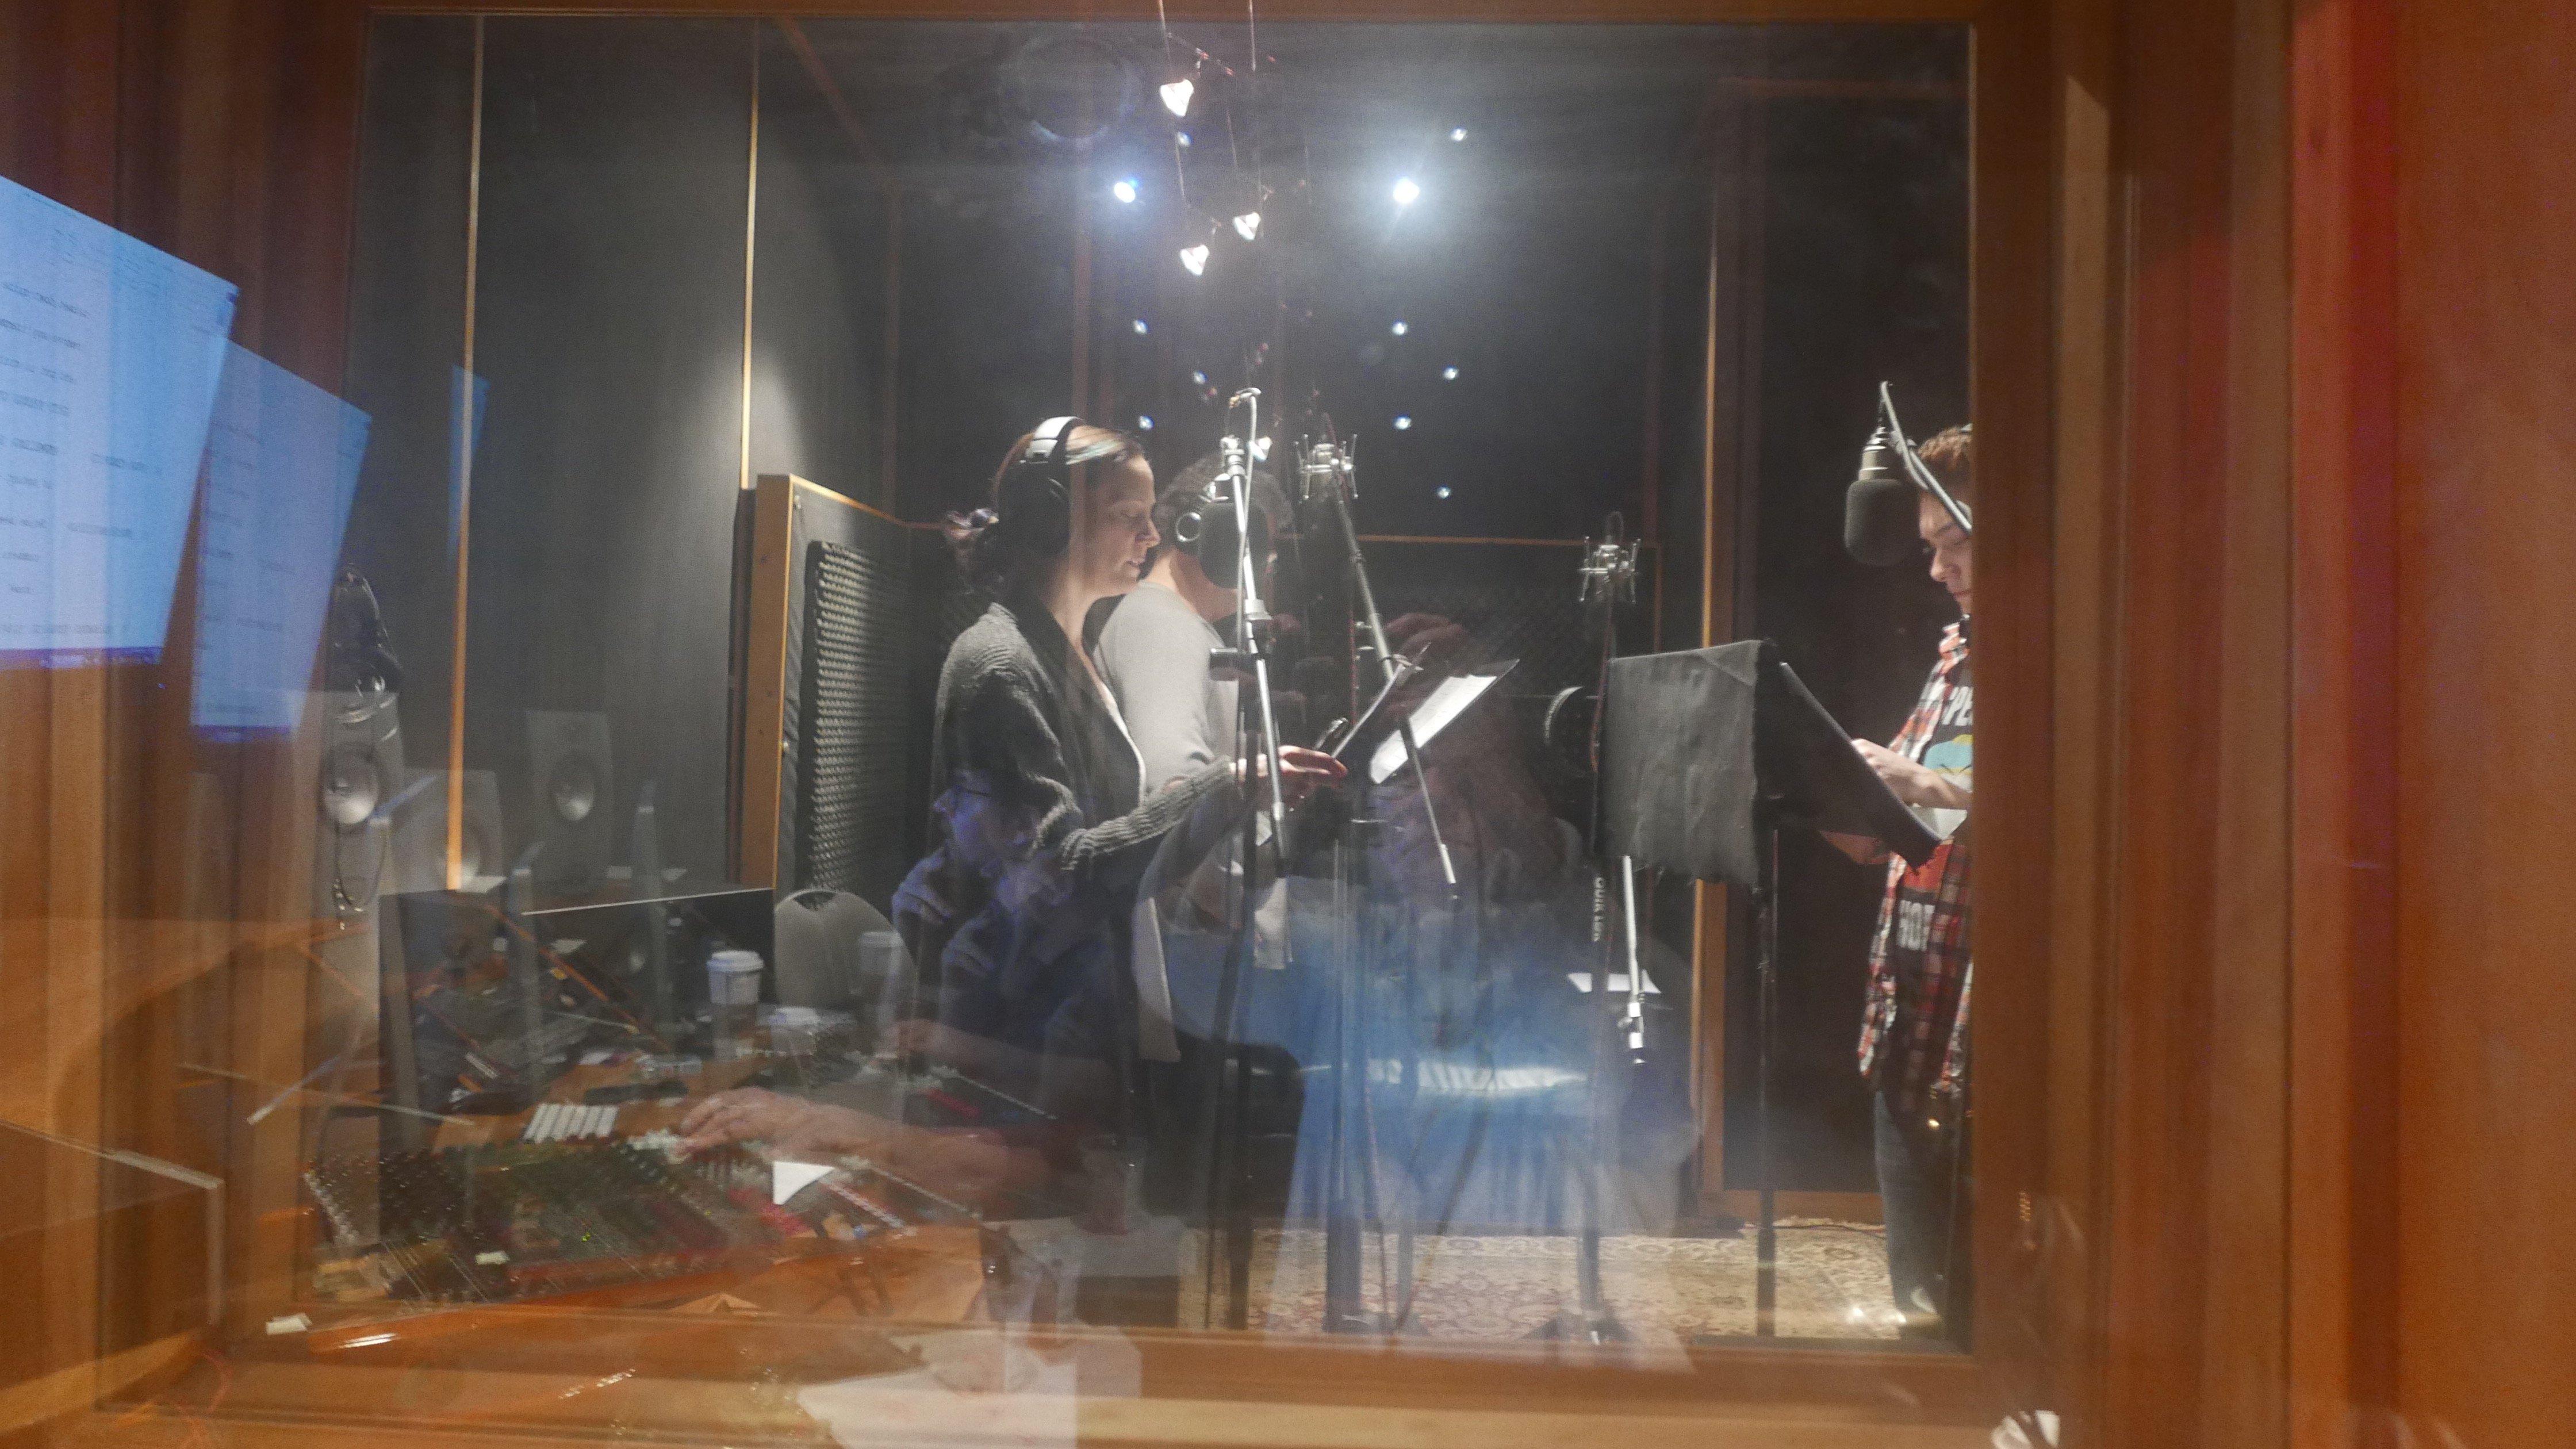 The Dark Air, Recording Studio Image, February 2017.